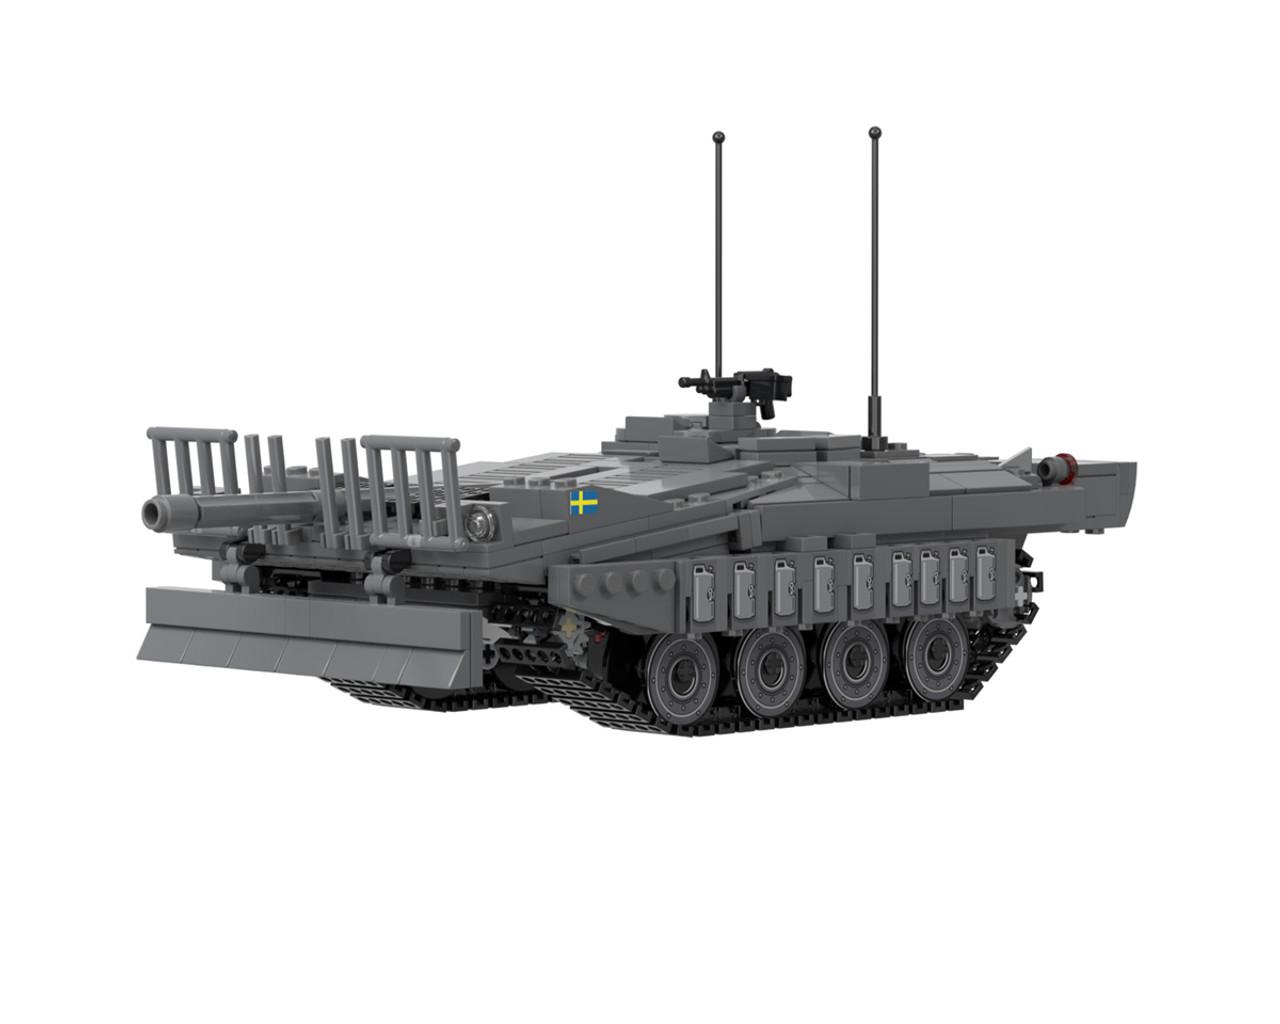 S-Tank - Stridsvagn 103 Main Battle Tank